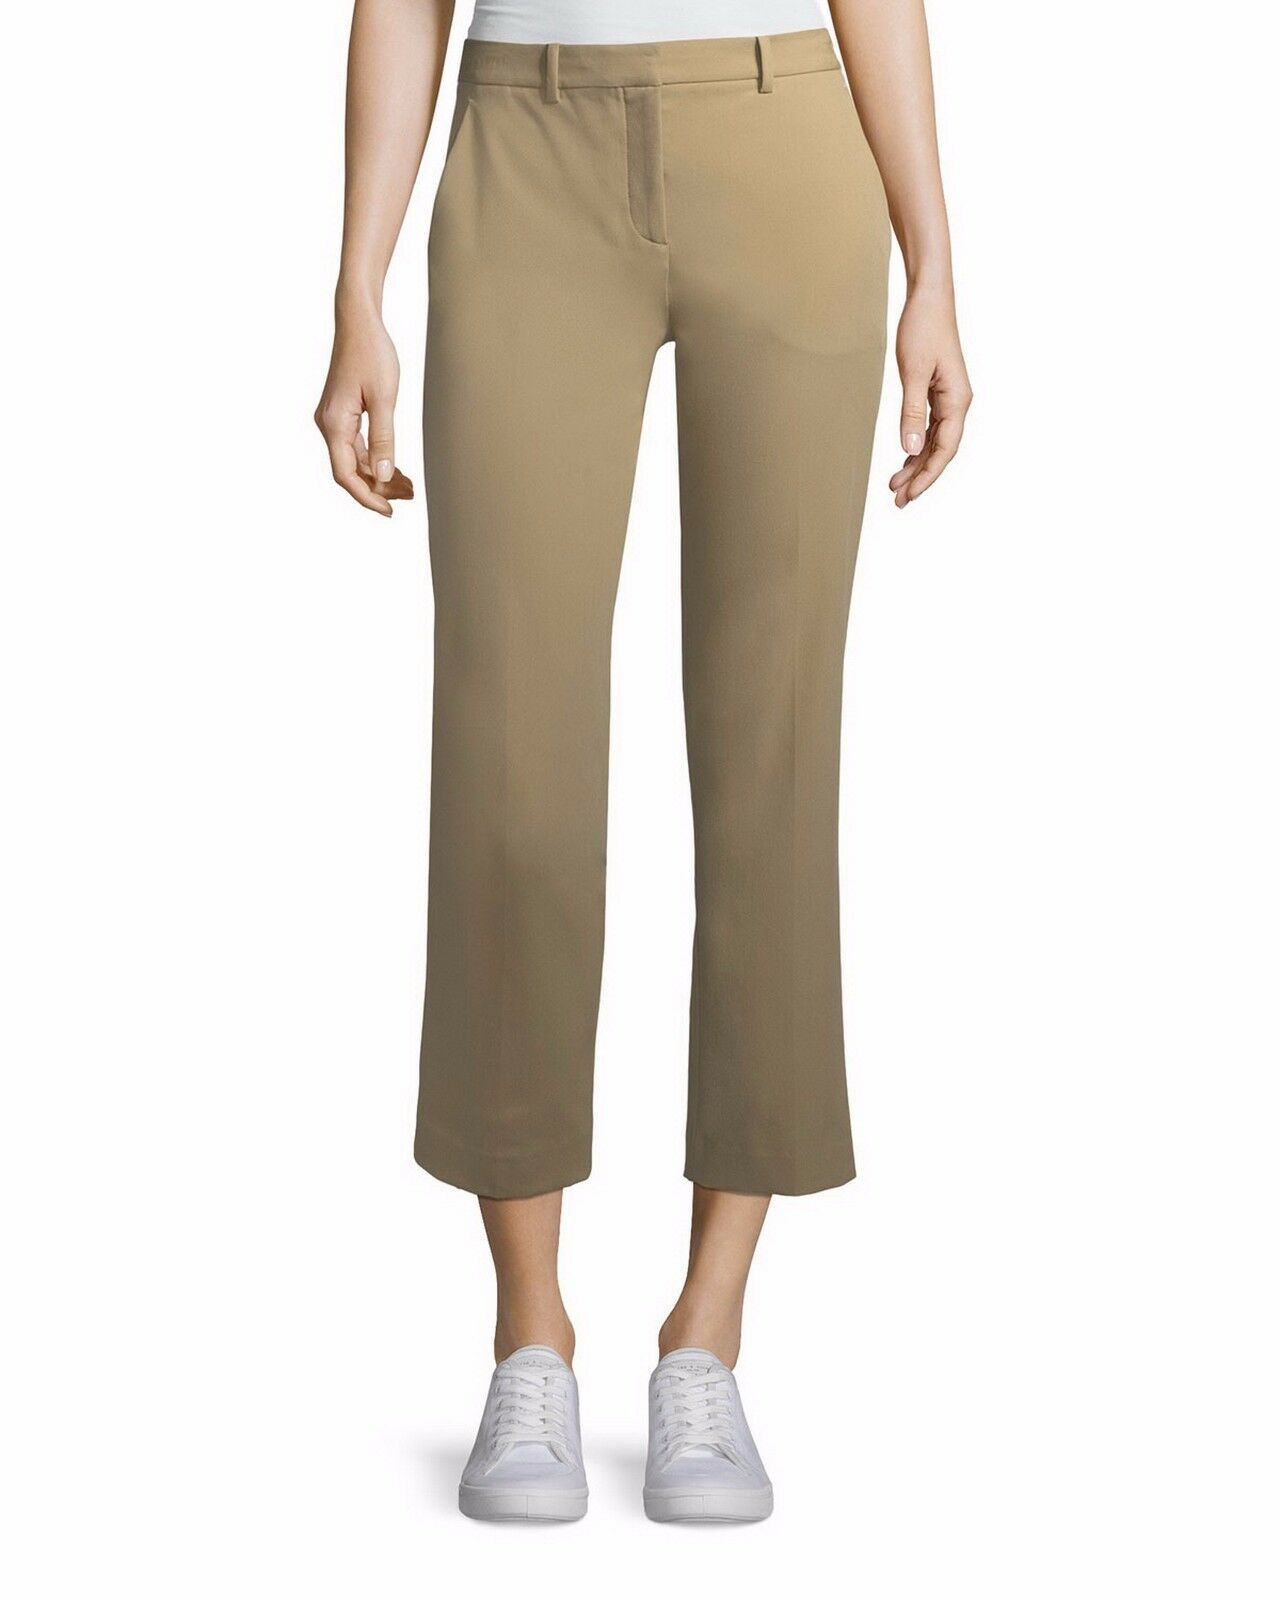 NWT TheoryHartsdale Approach Flare Leg Pants,Sierra, Größe 2,  275 retail